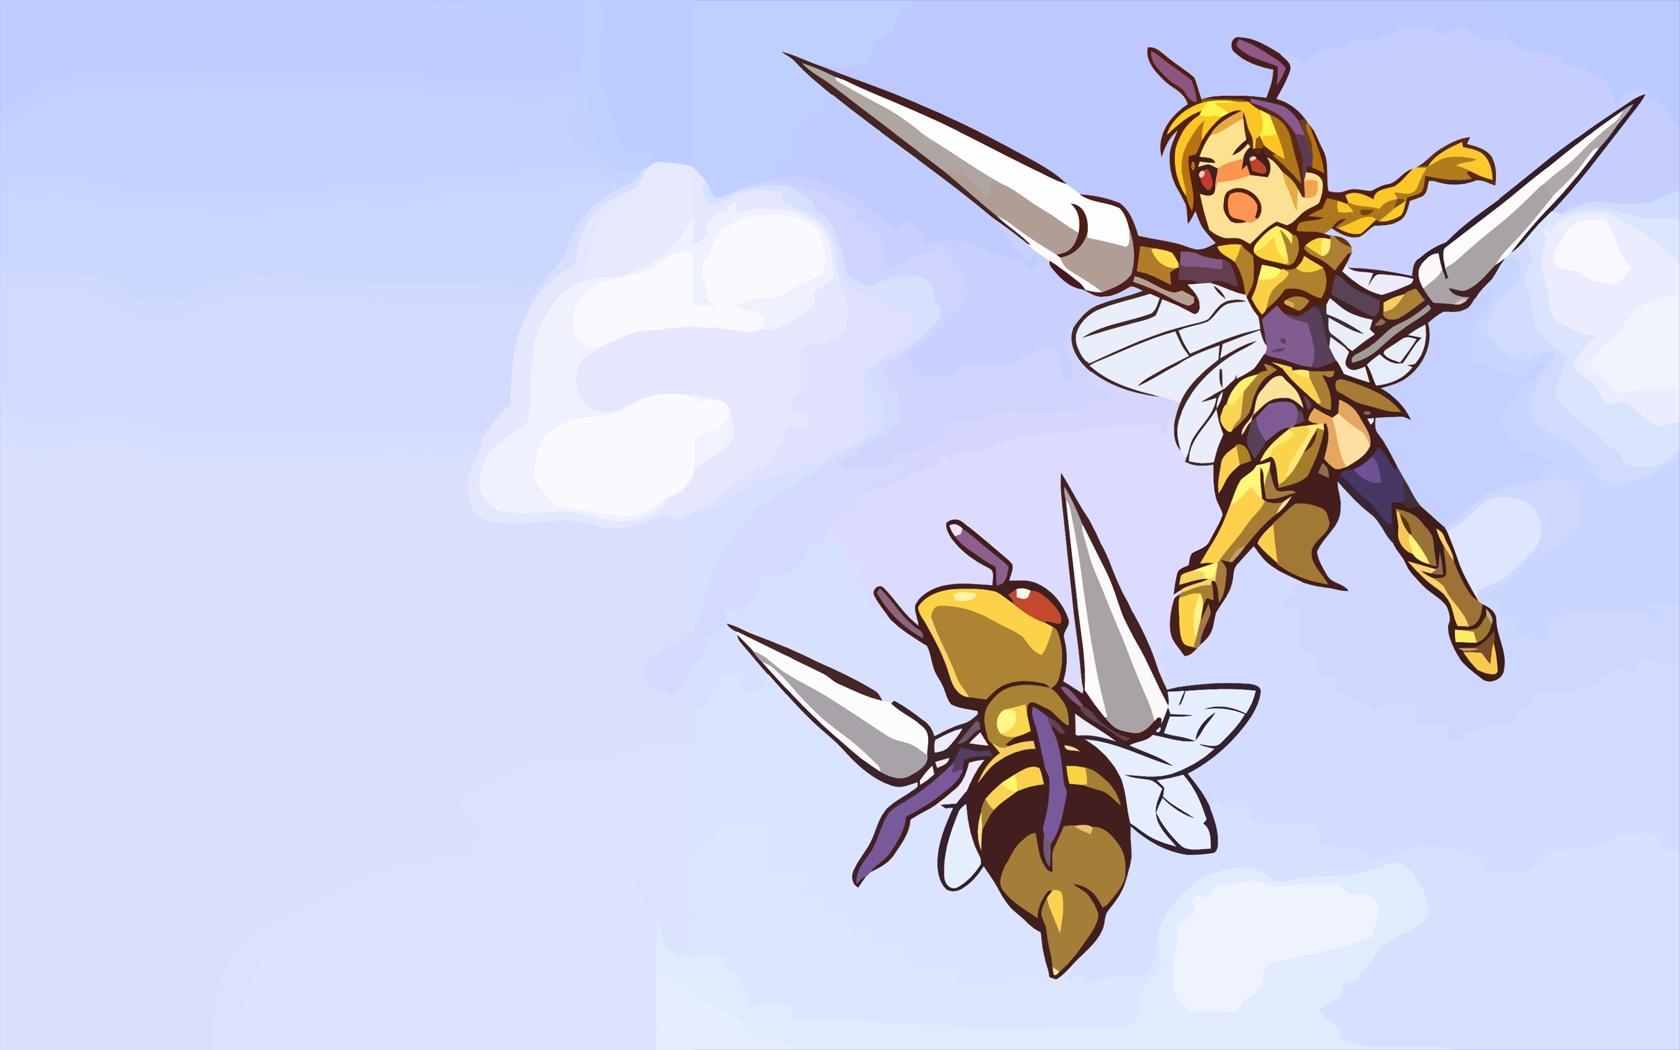 beedrill hitec moemon pokemon